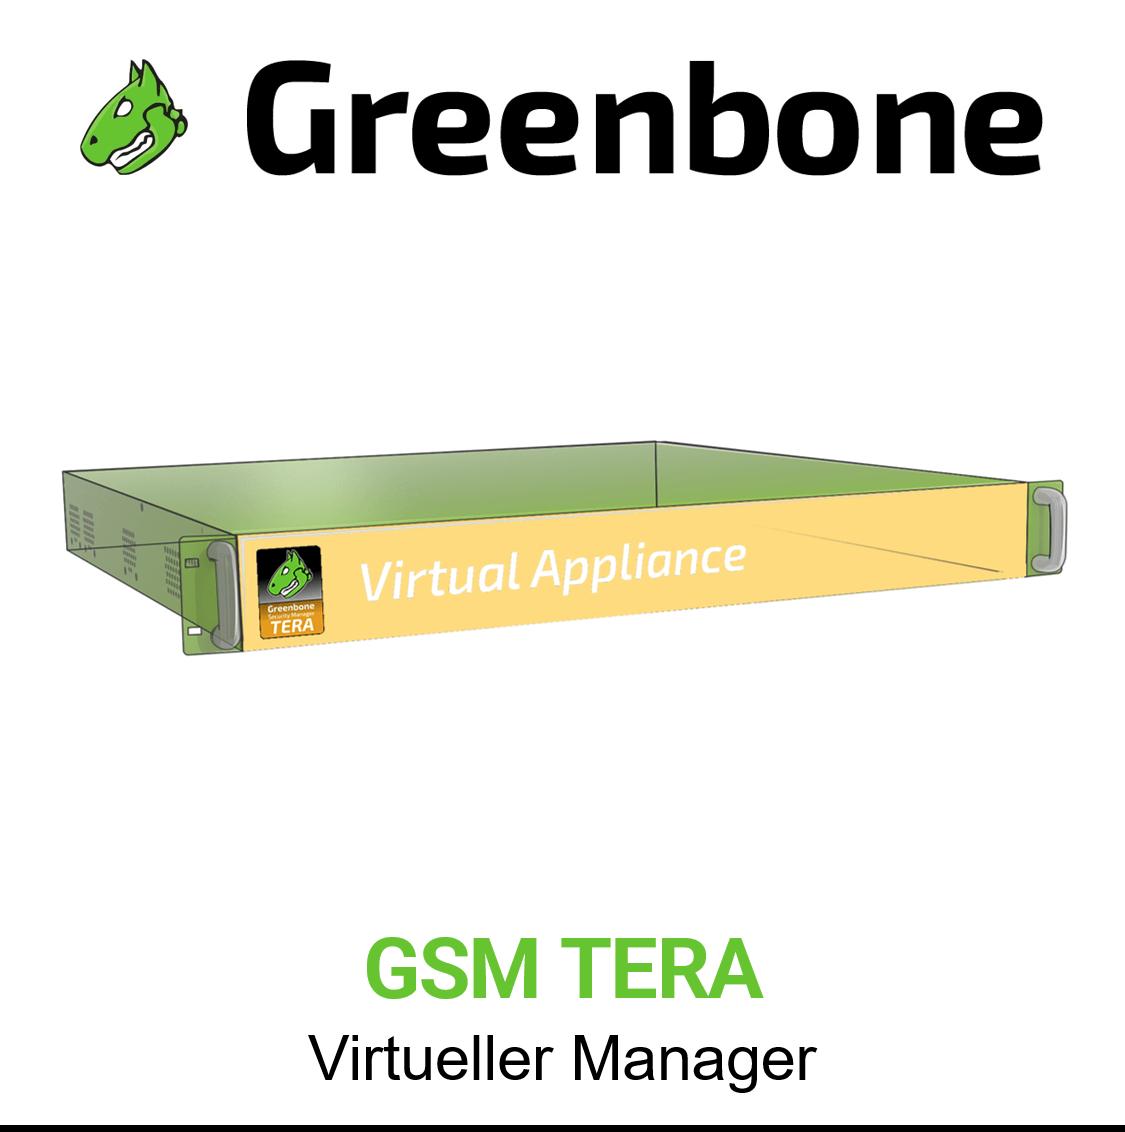 Greenbone GSM TERA Virtuelle Appliance